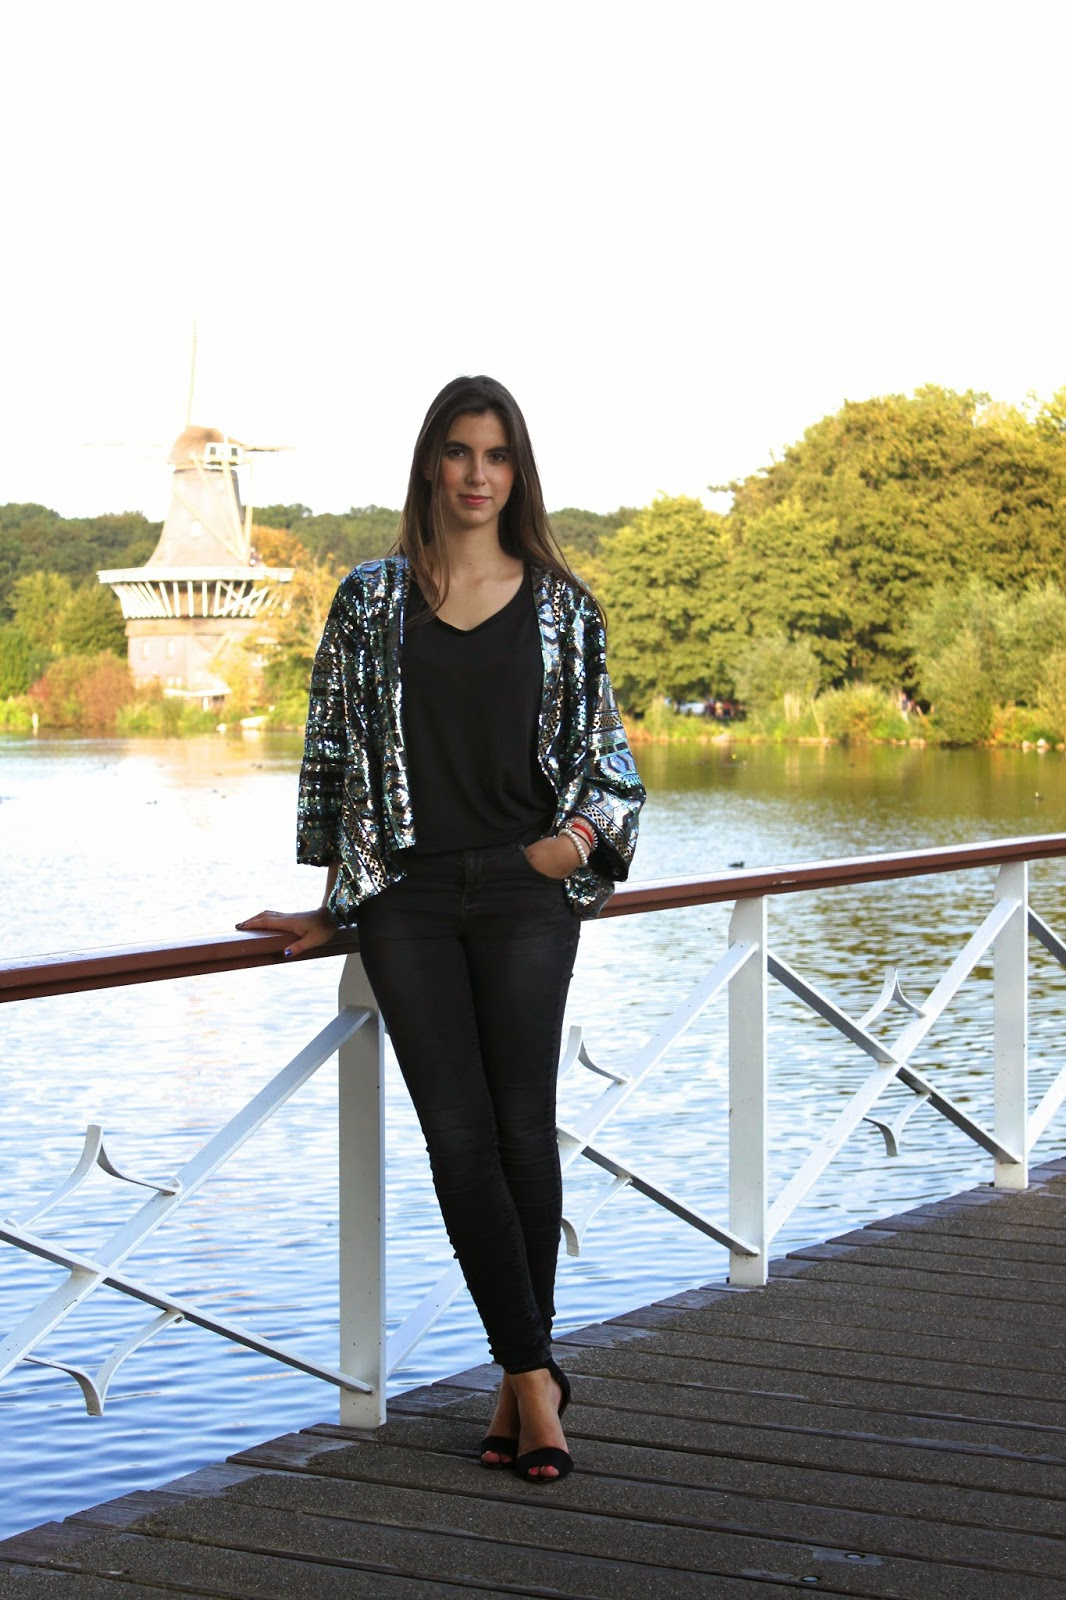 4d4abb5e3763 Arifashionthread - Luxembourg Fashion and Lifestyle Blog  Glitter kimono